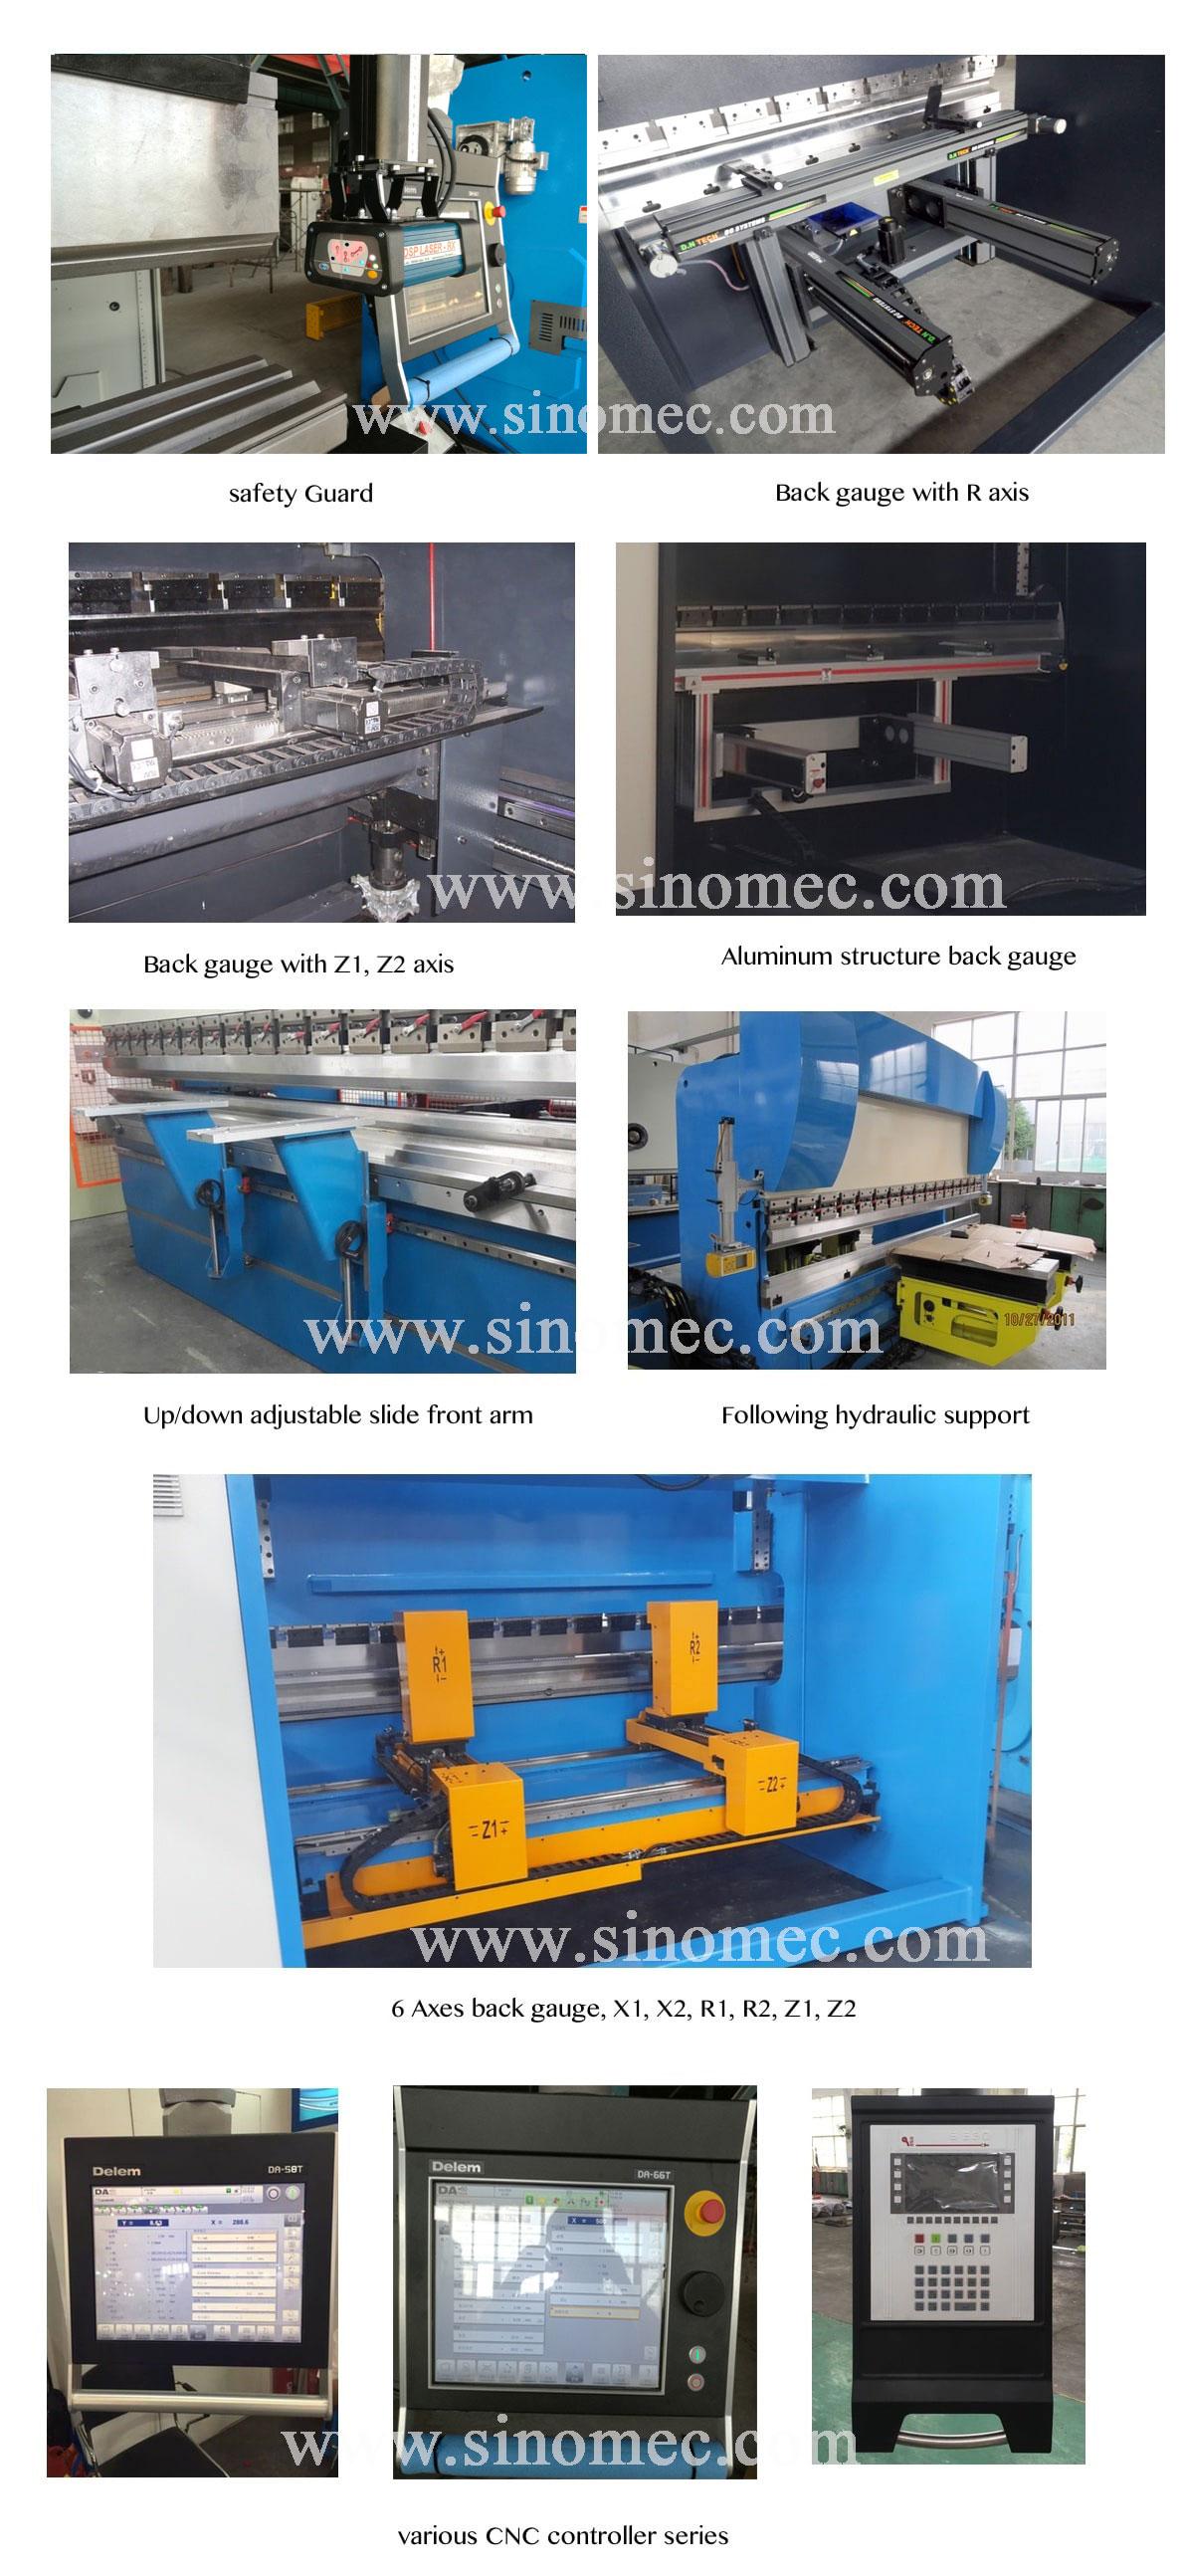 CNC-Machine-detail (2).jpg